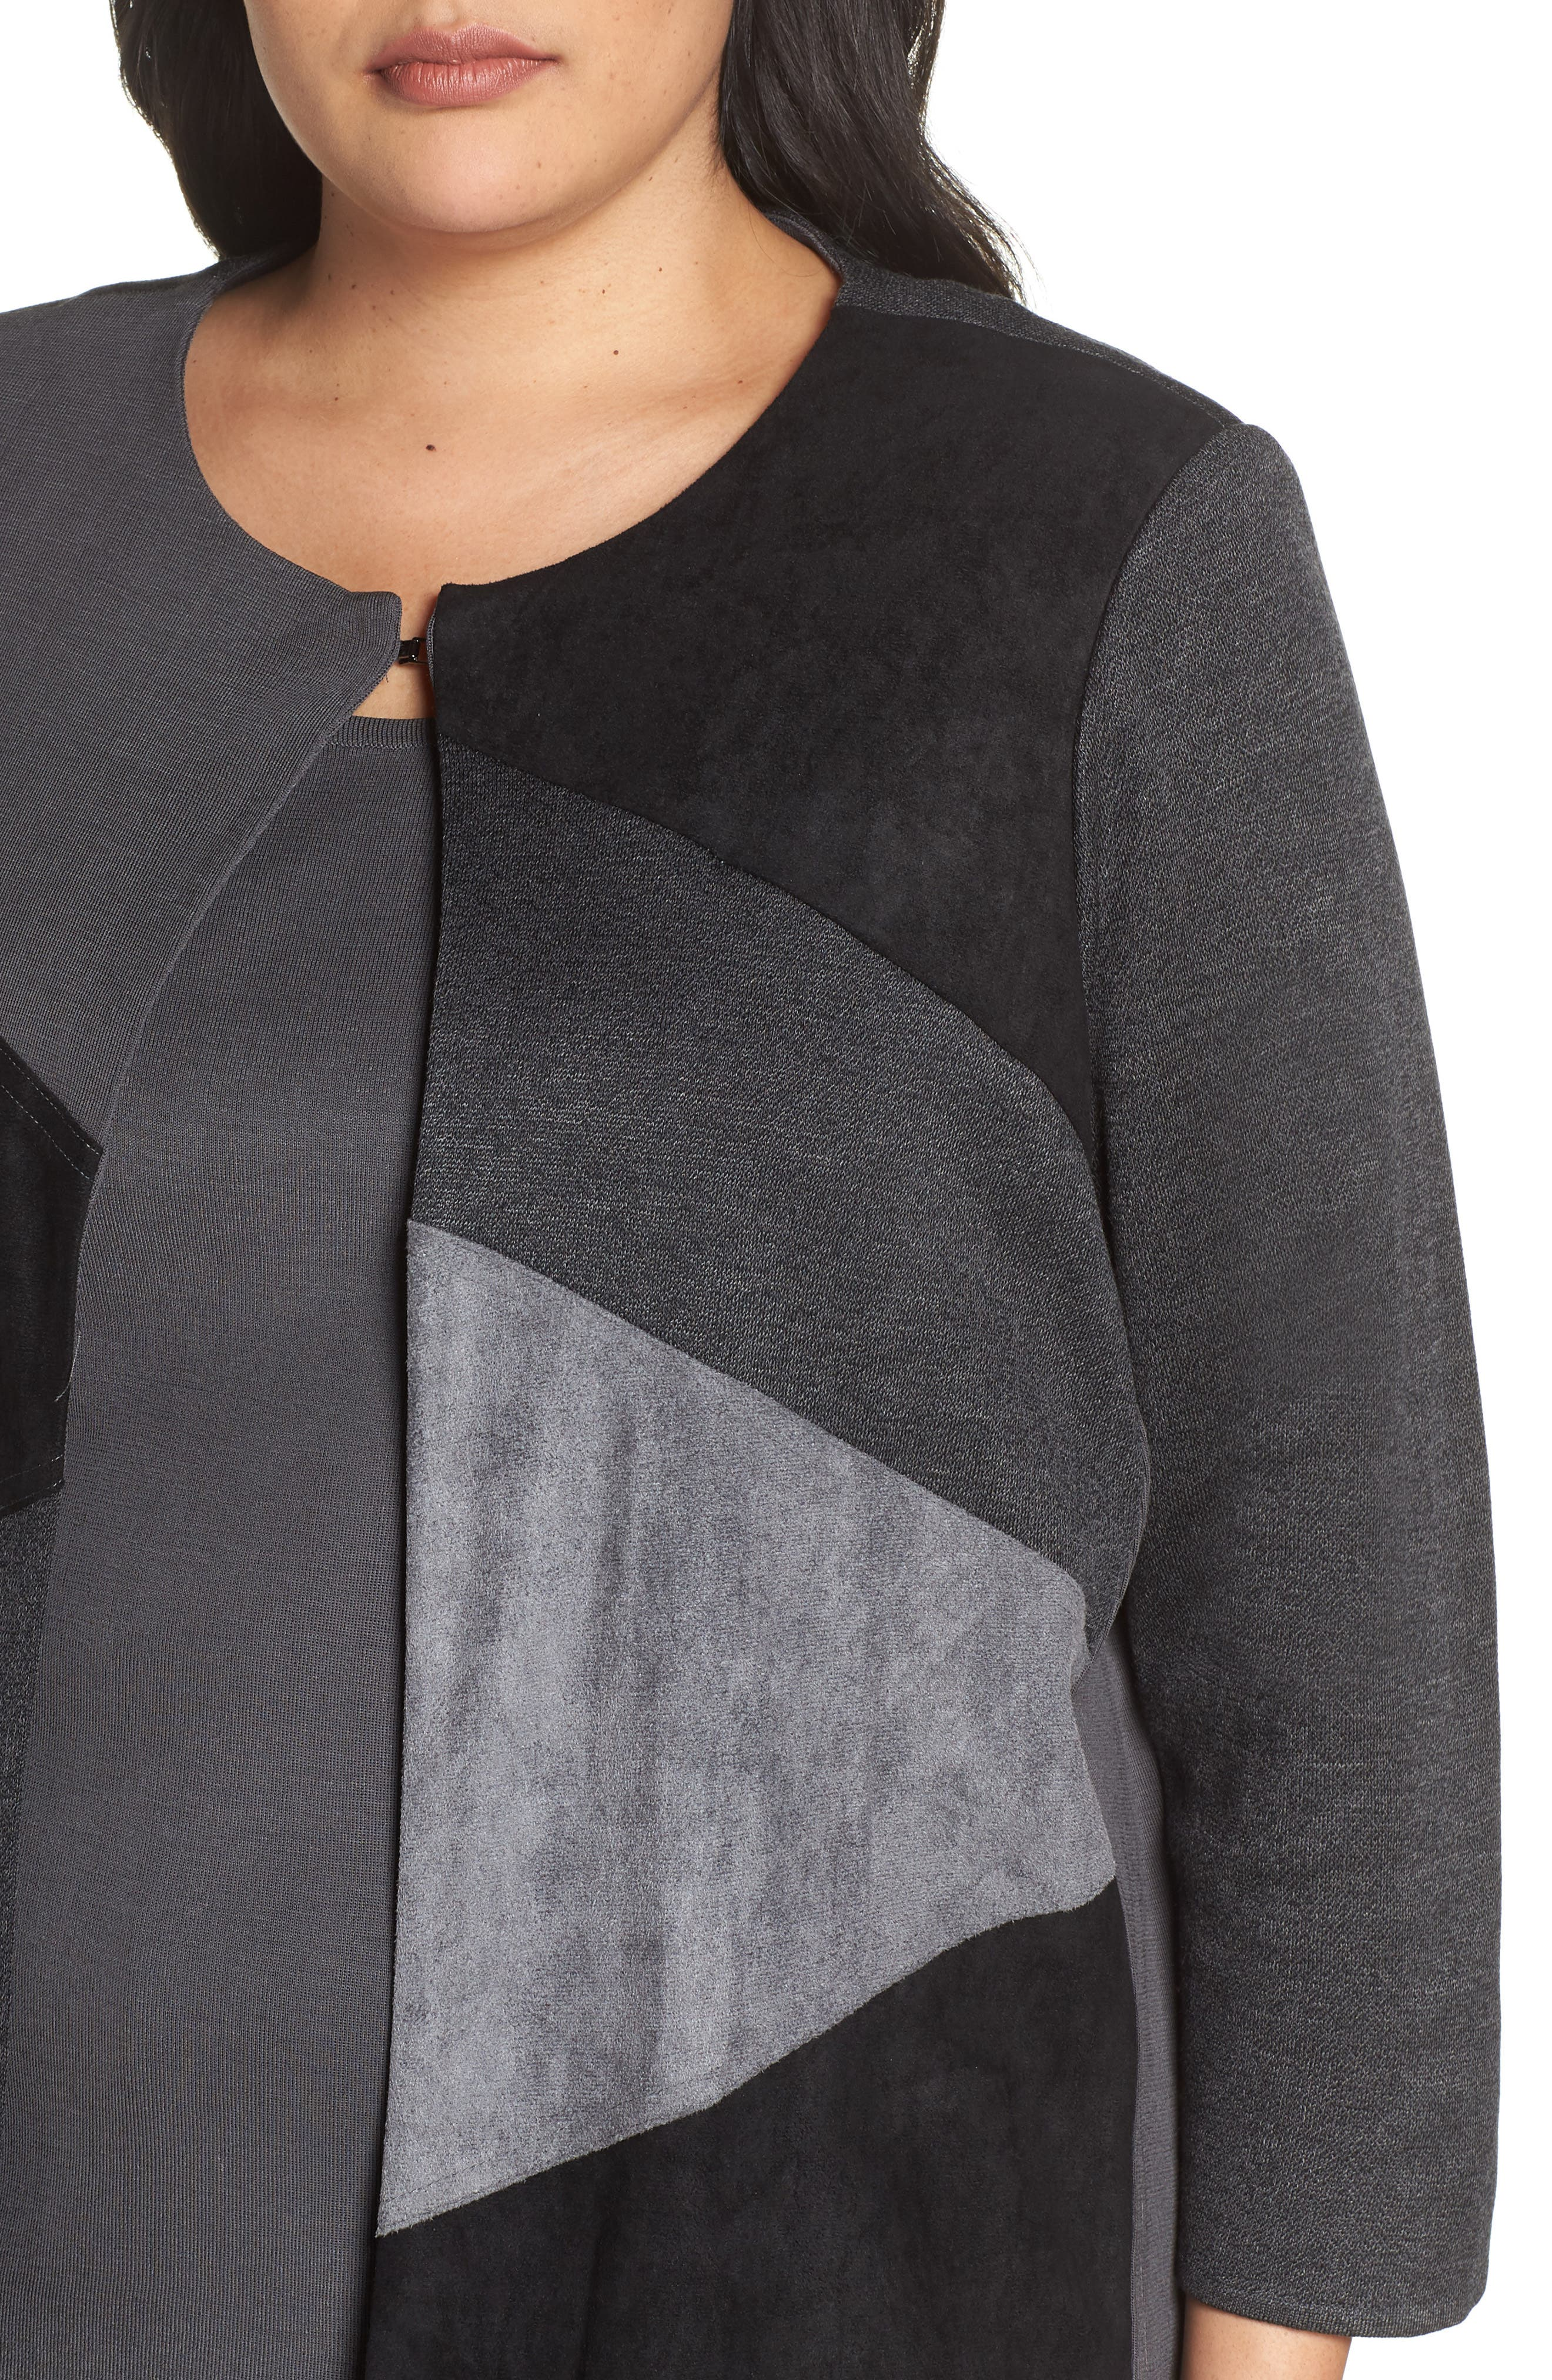 MING WANG,                             Colorblock Knit Jacket,                             Alternate thumbnail 4, color,                             BLACK/ GRANITE